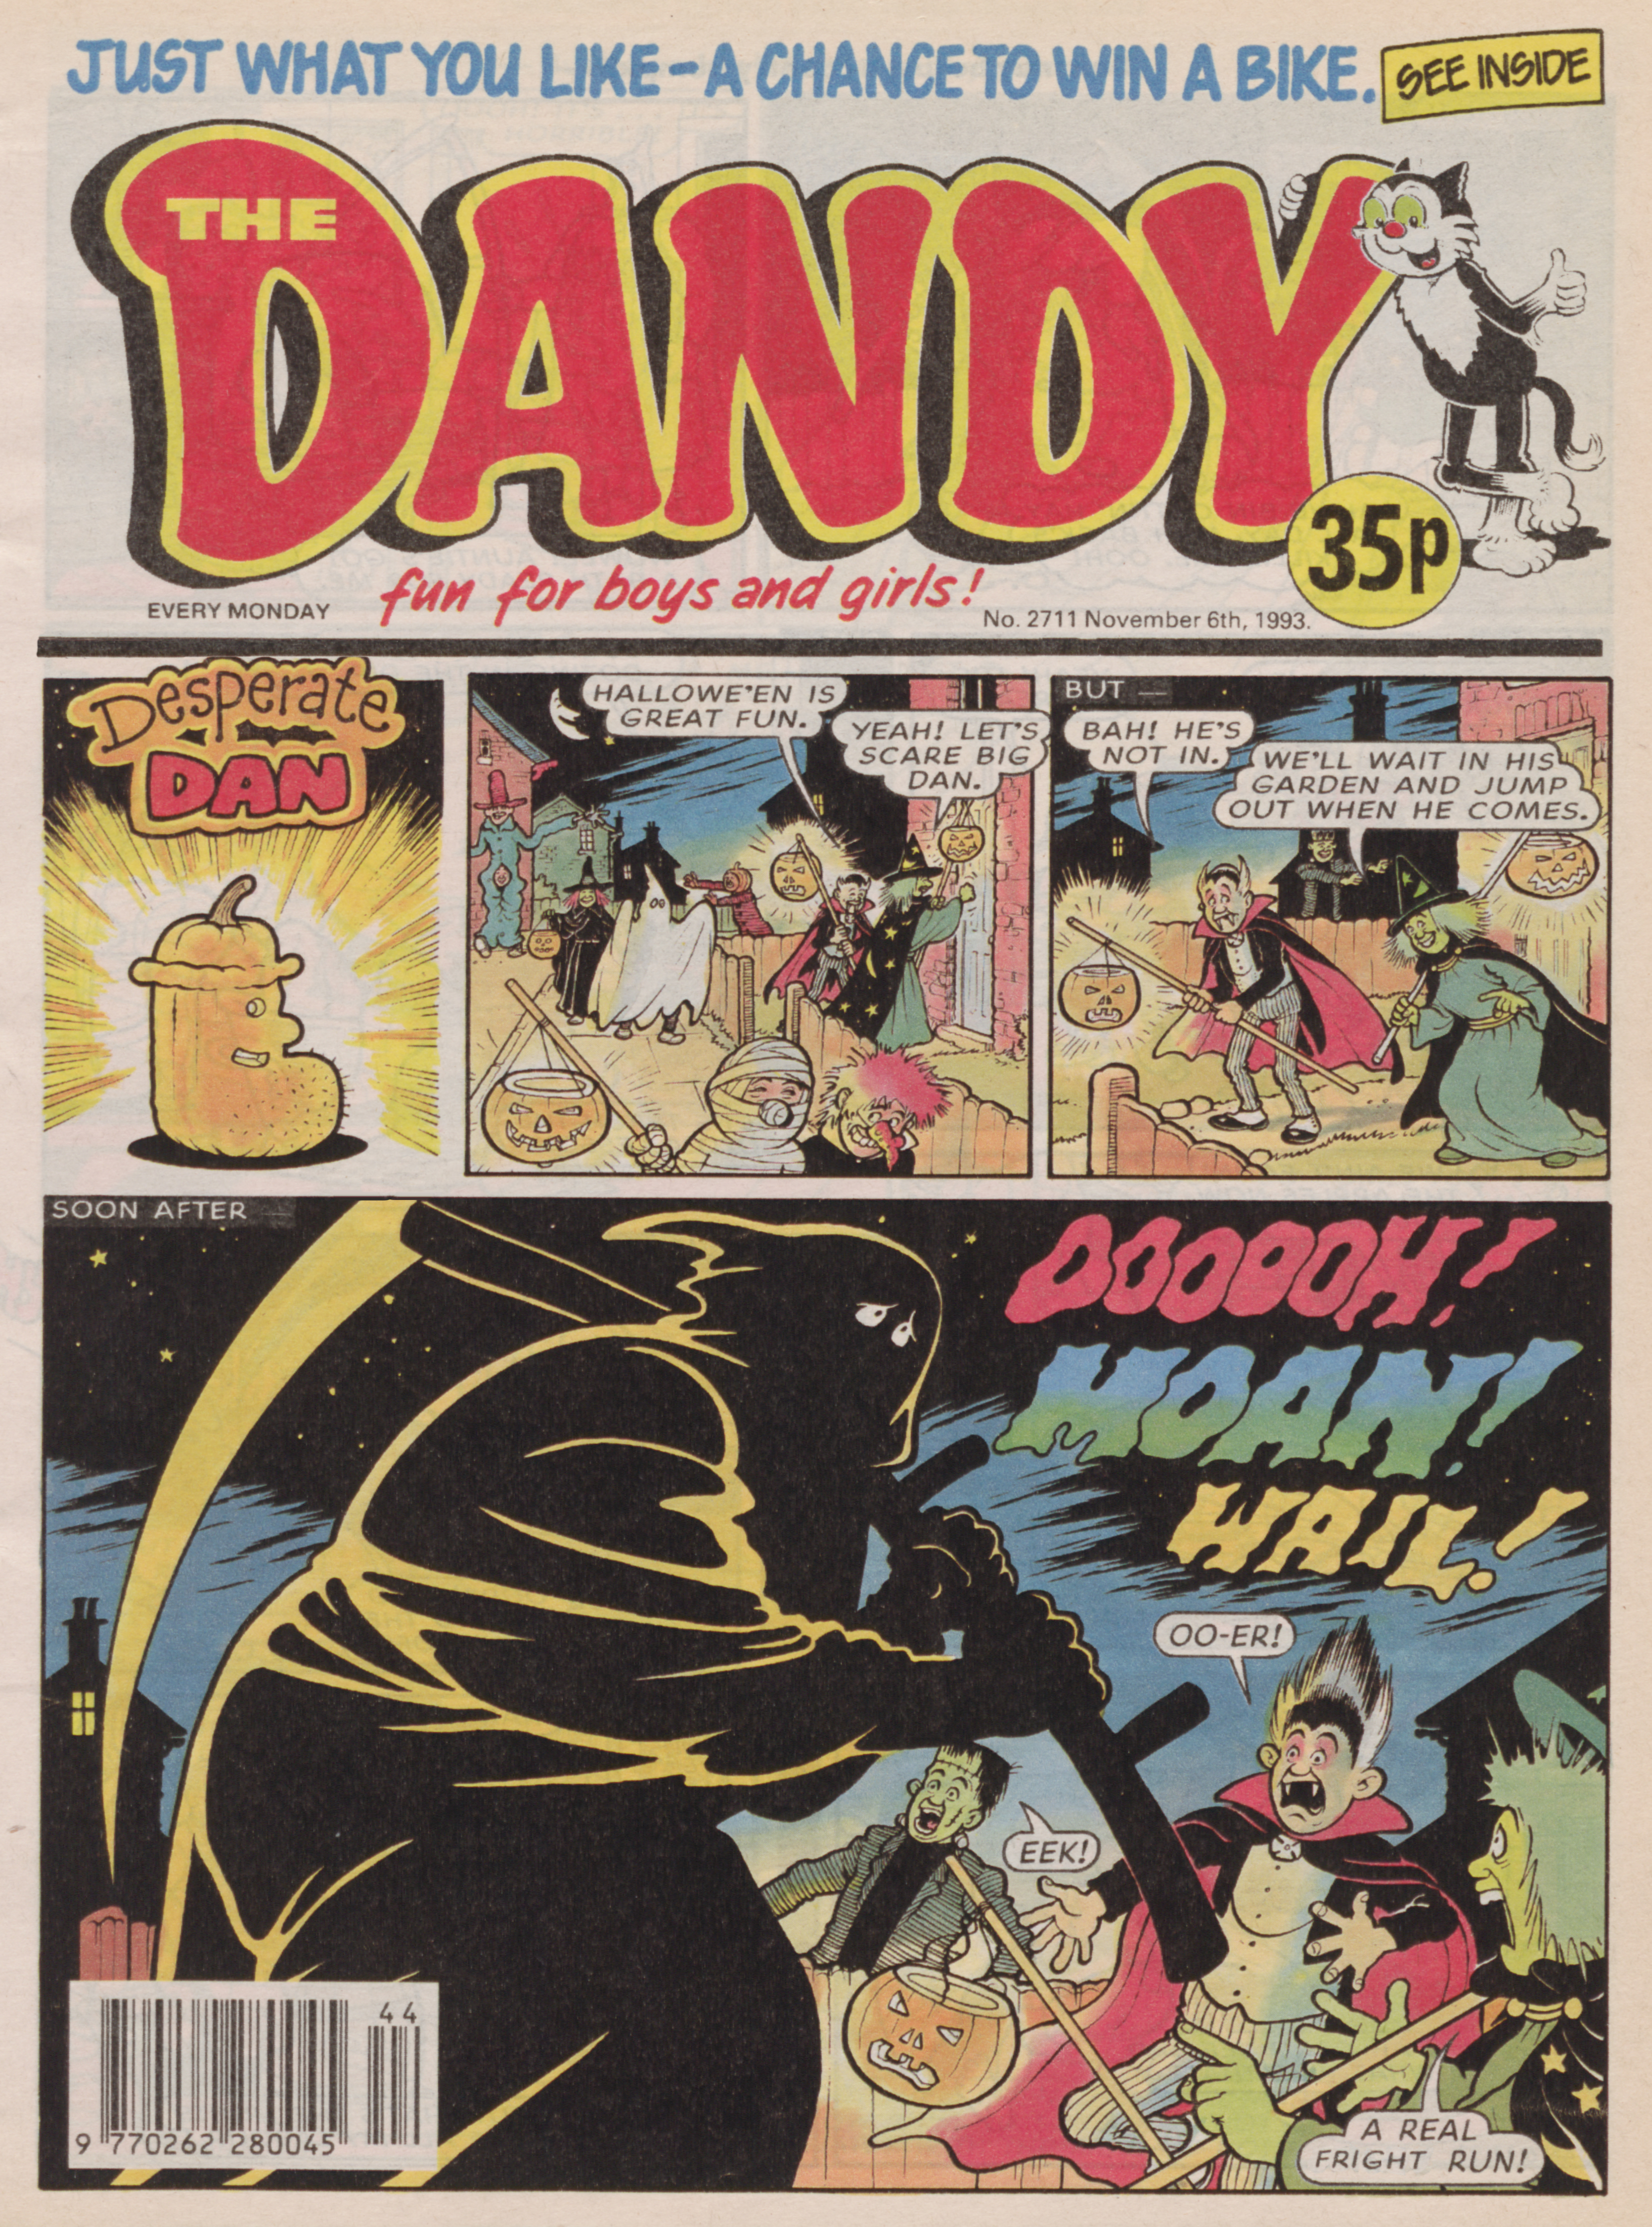 Desperate Dan: Dandy No. 2711, November 6th, 1993 COVER